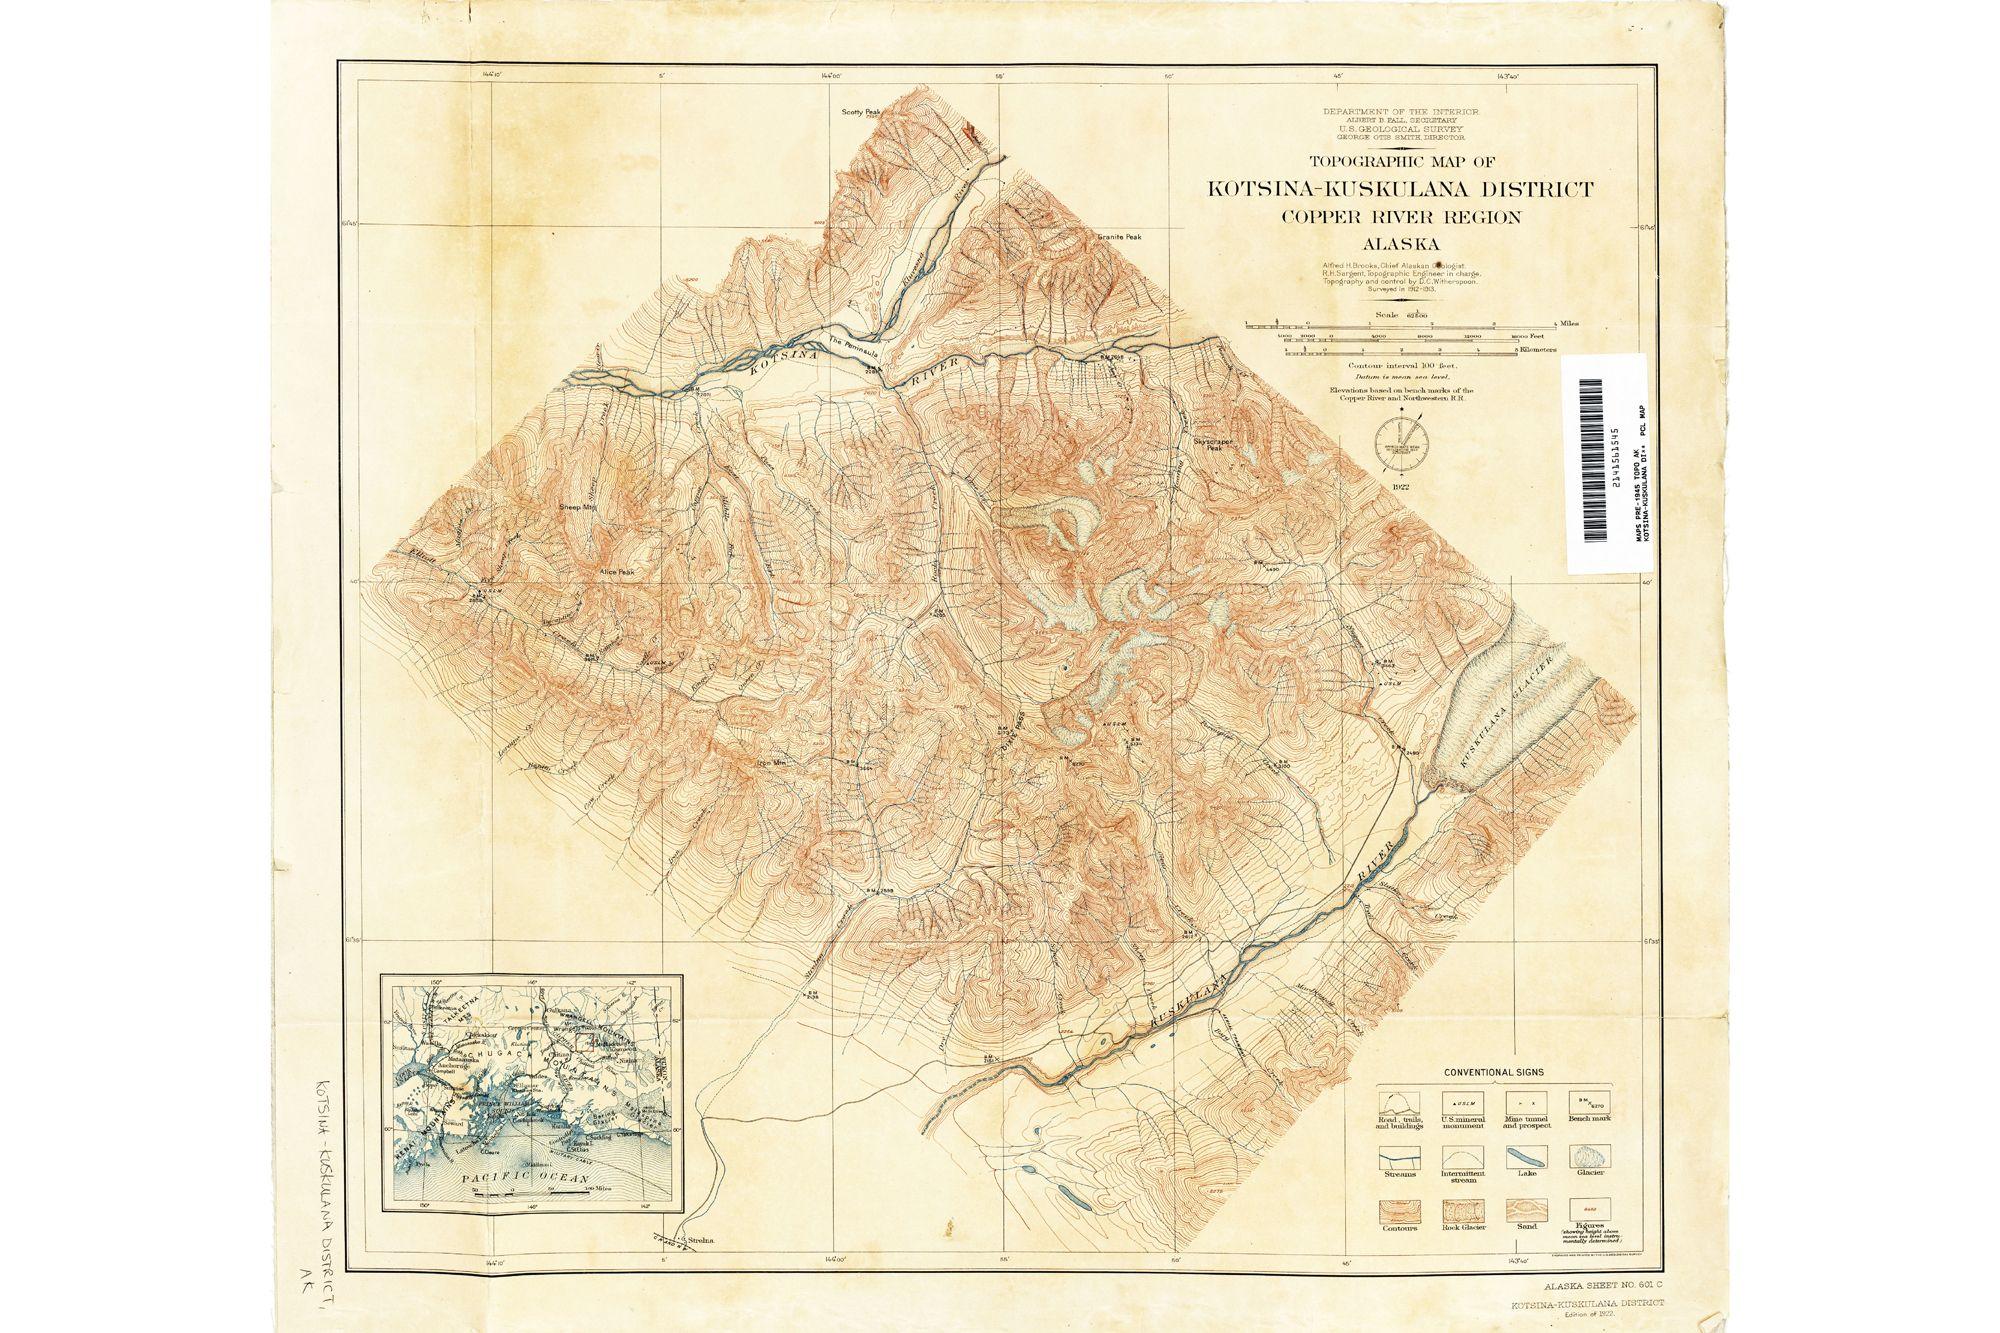 Alaska Topographic Maps, USGS - ATLAS OF PLACES ...